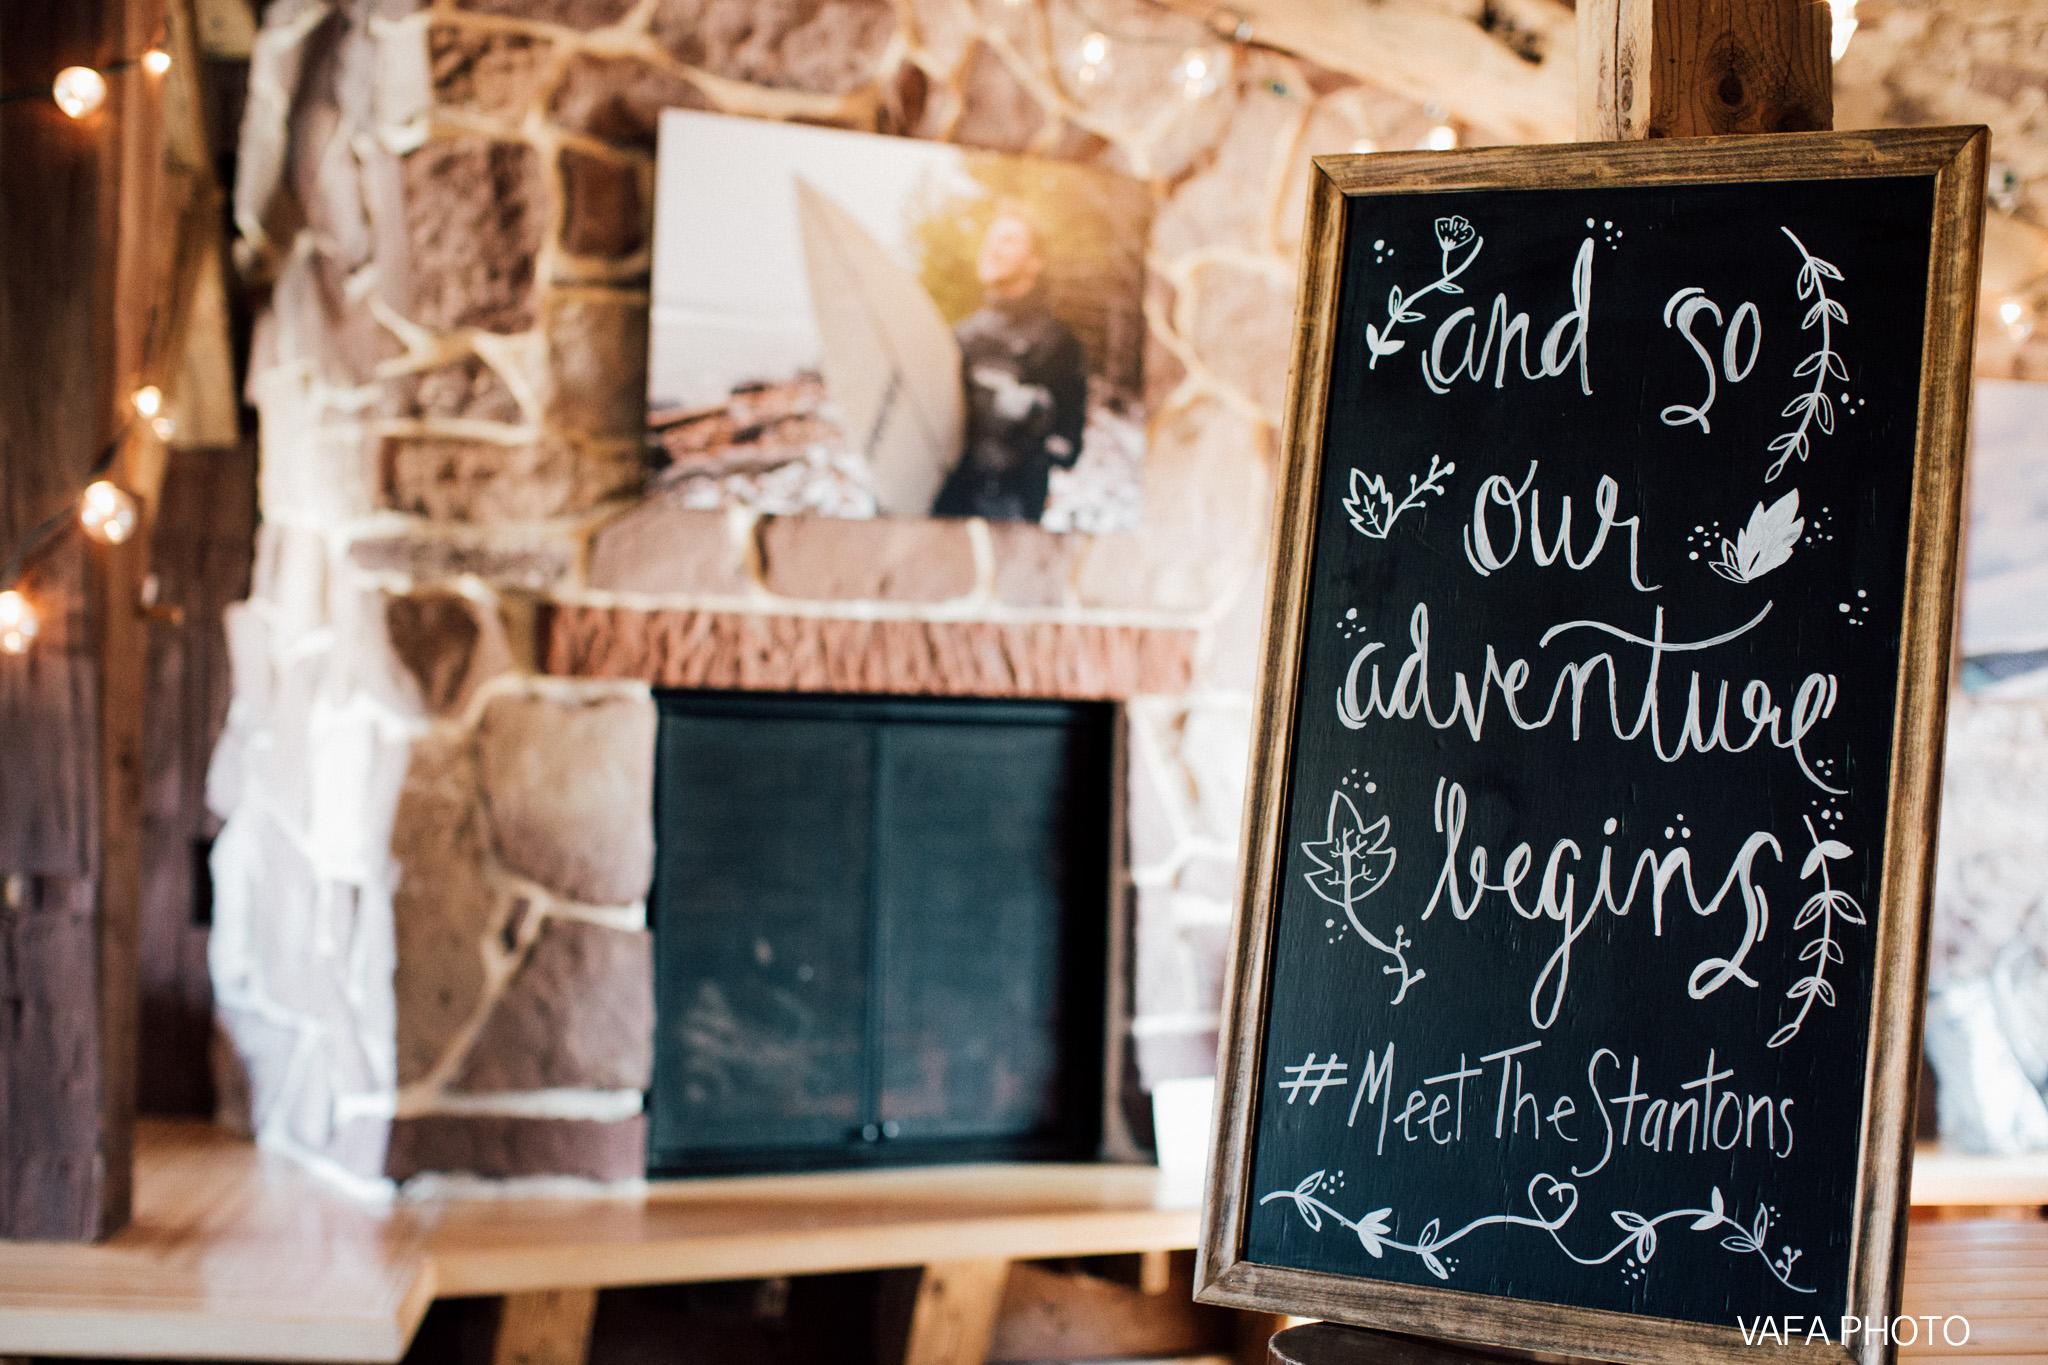 Hogback-Mountain-Wedding-Chelsea-Josh-Vafa-Photo-678.jpg